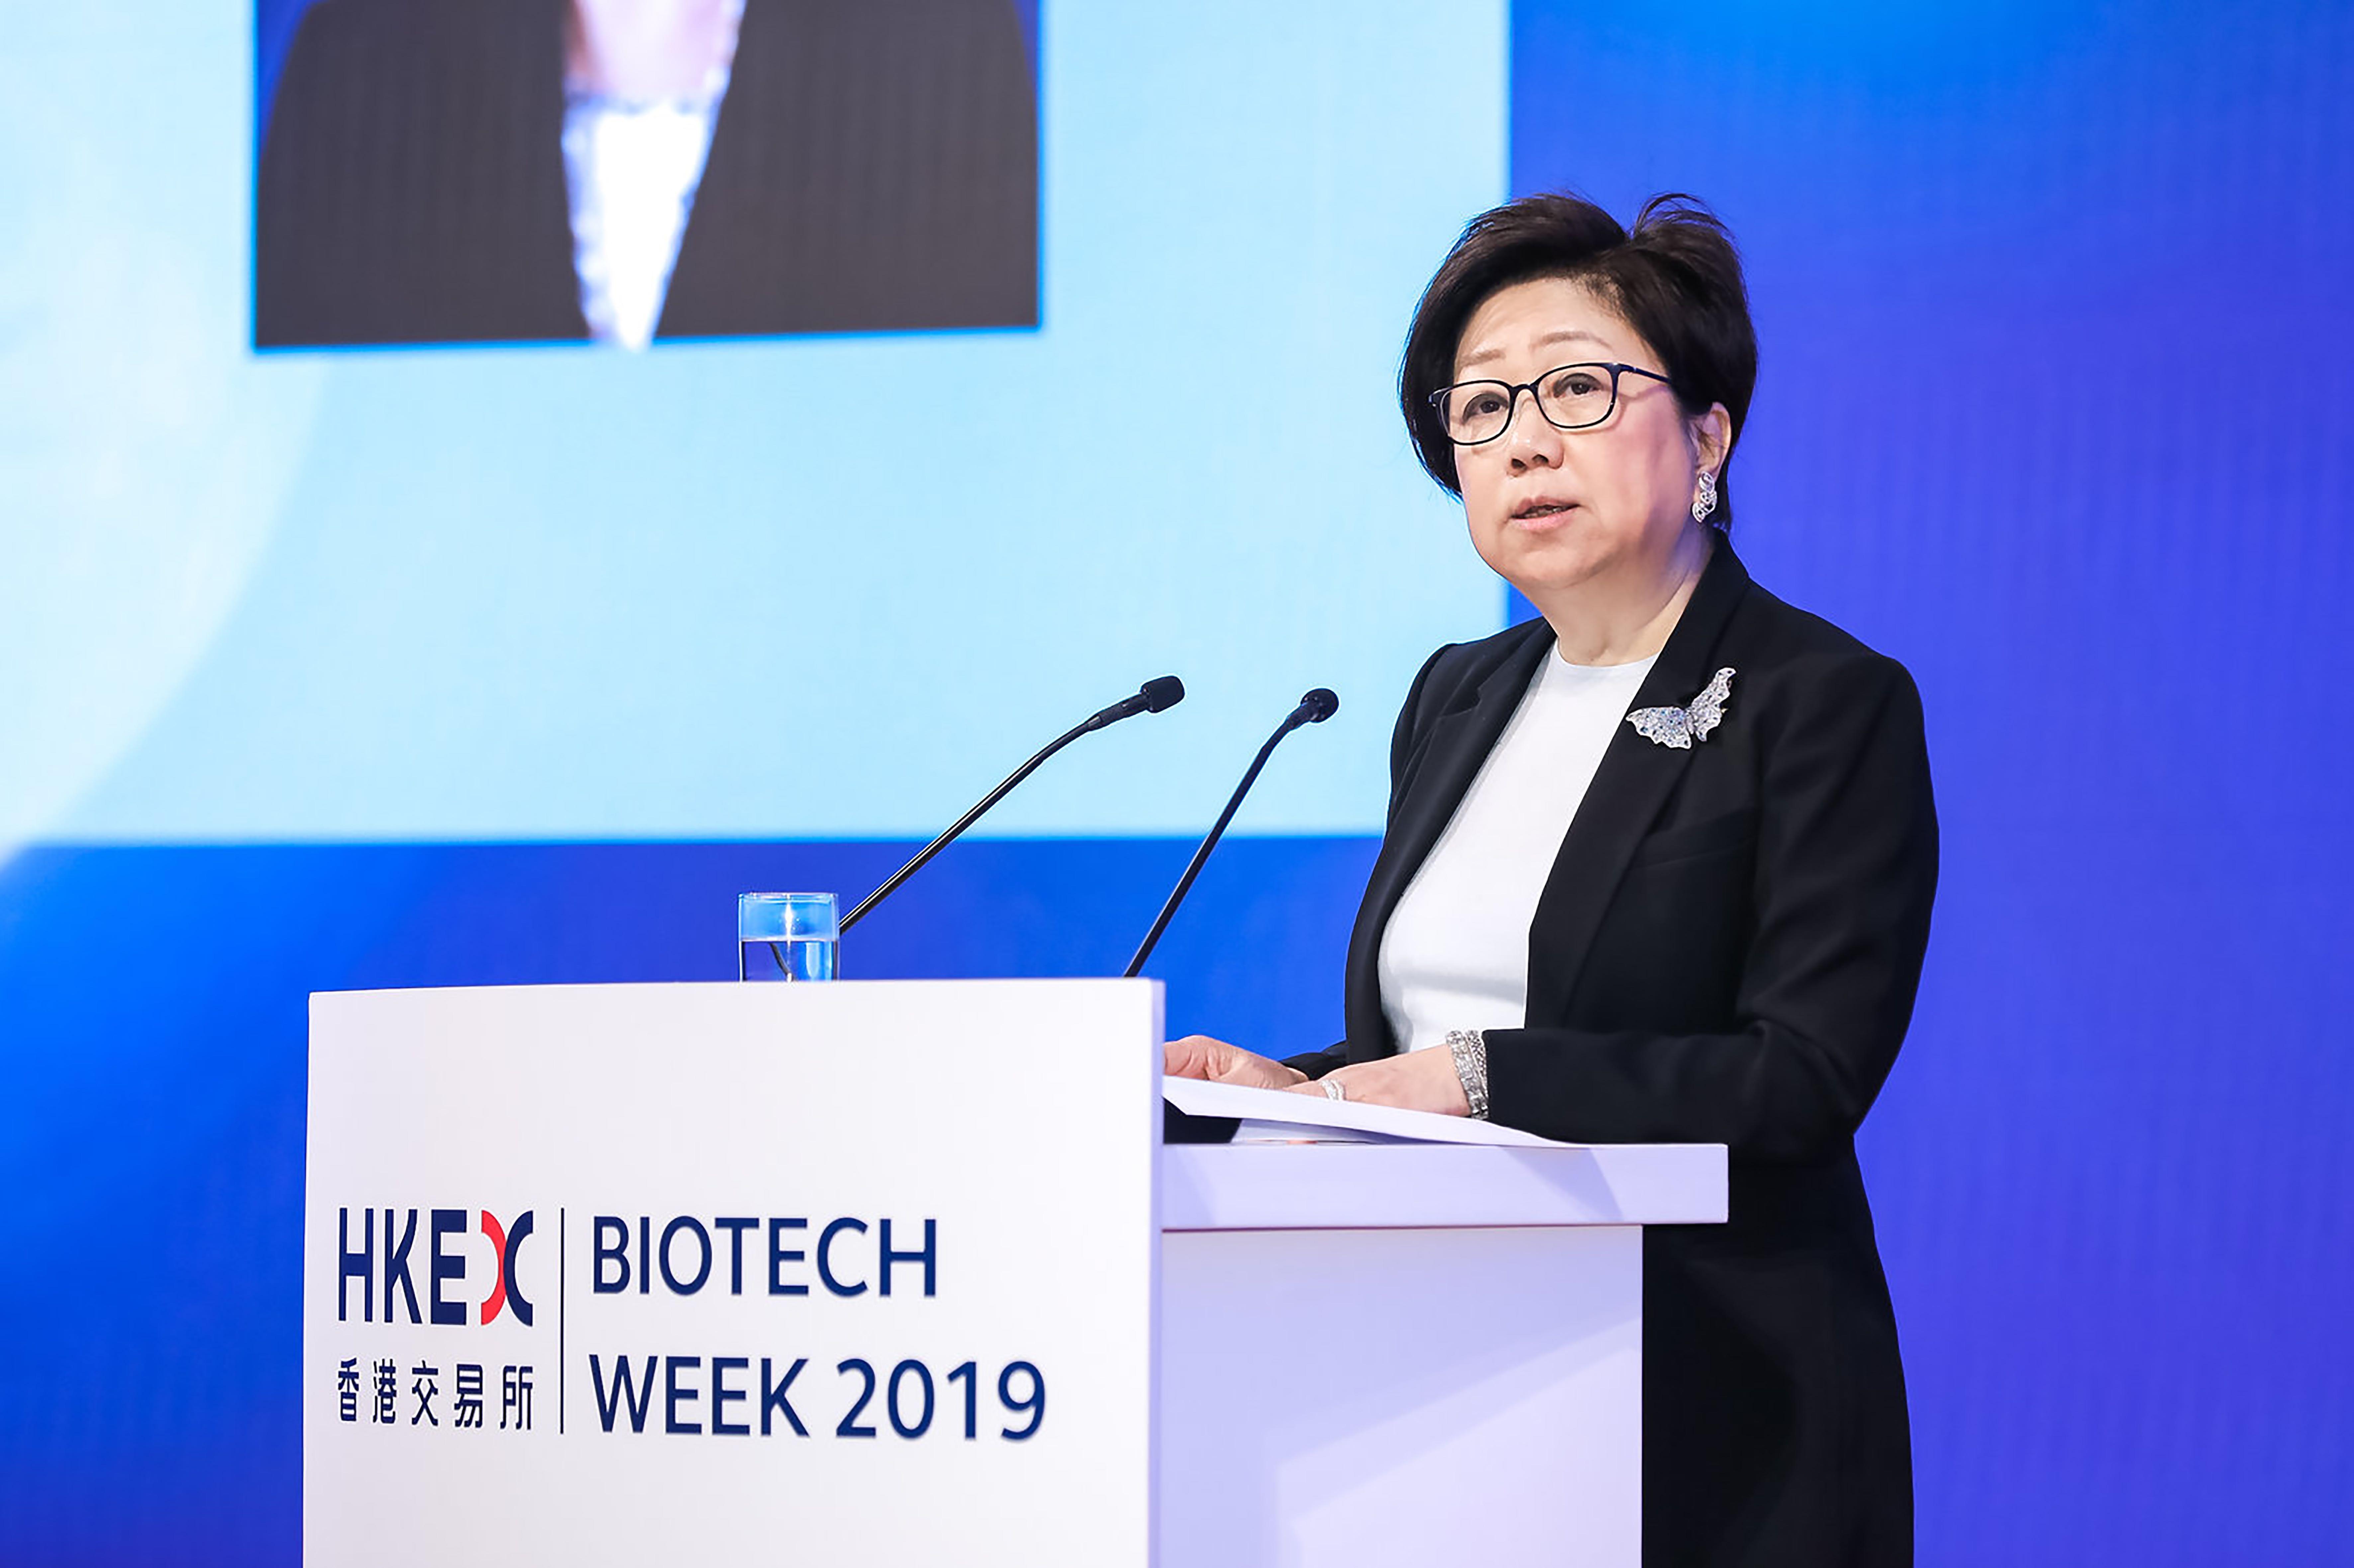 Photo of Biotech Week 2019 (Laura Cha).jpg